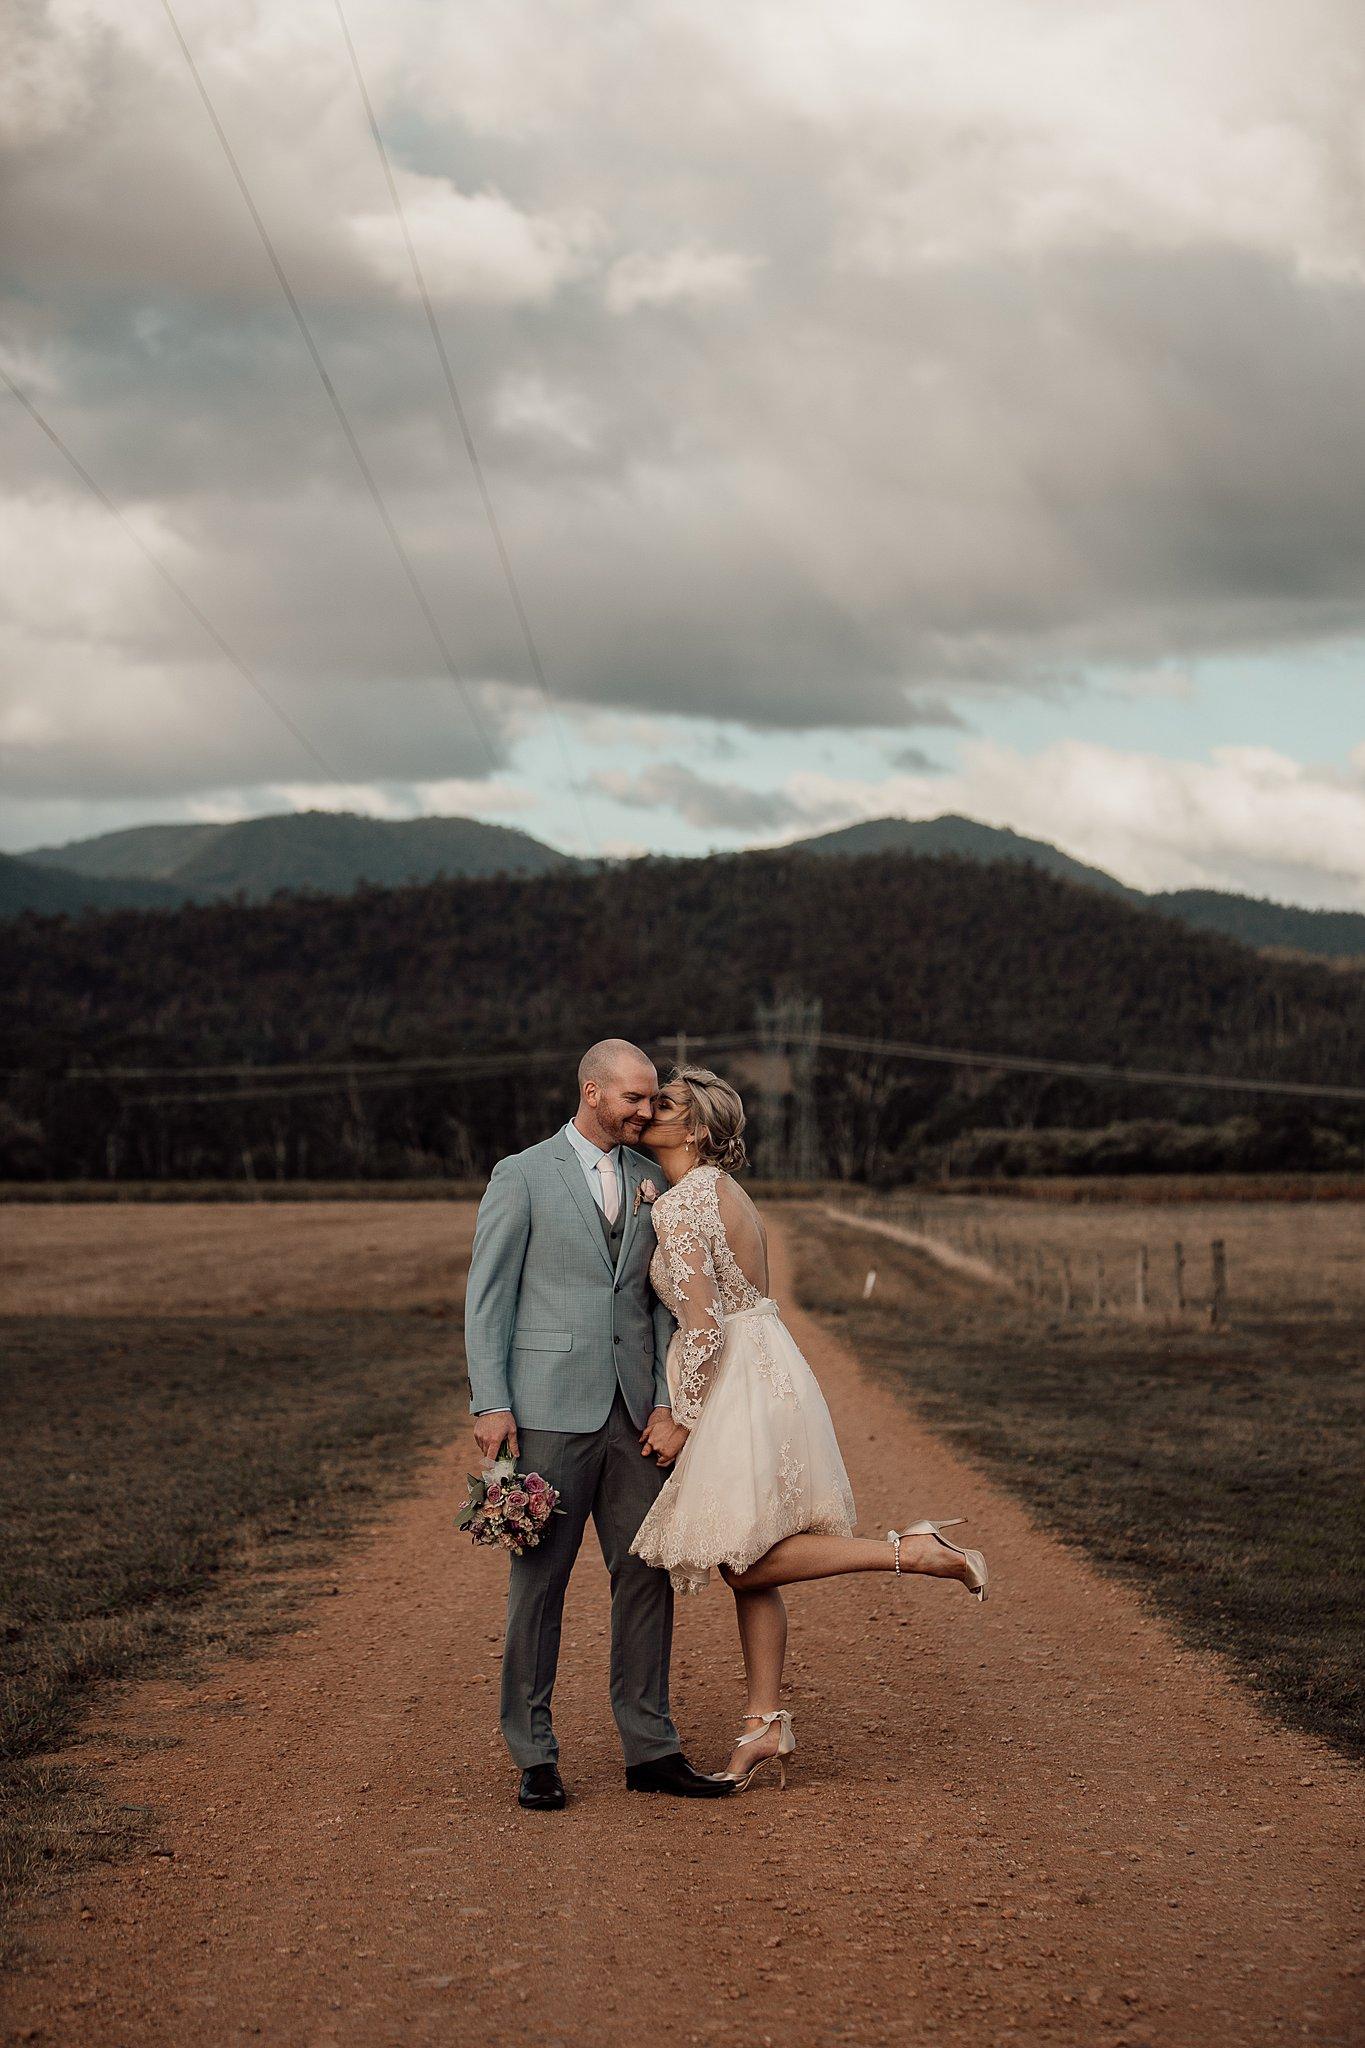 mickalathomas_puremacphotography_weddingphotographer_couplephotographer_Sheppartonphotographer_3459.jpg